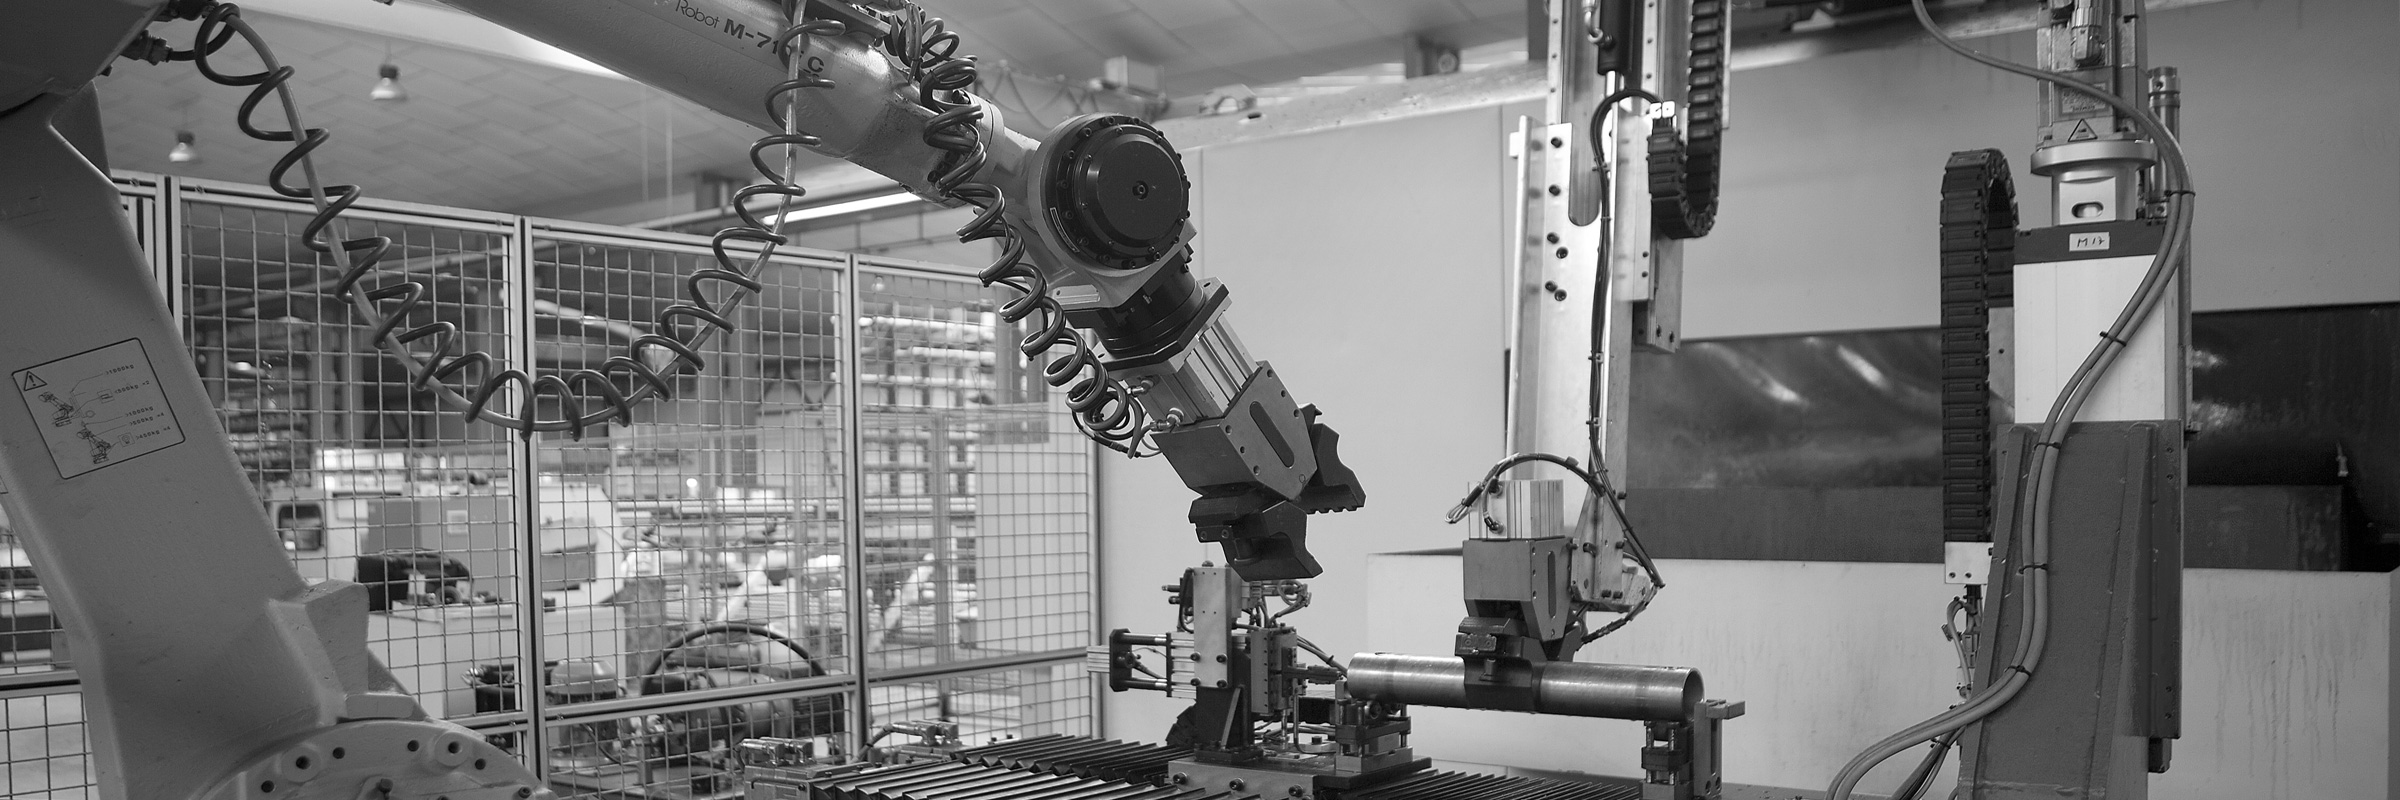 portada-robot